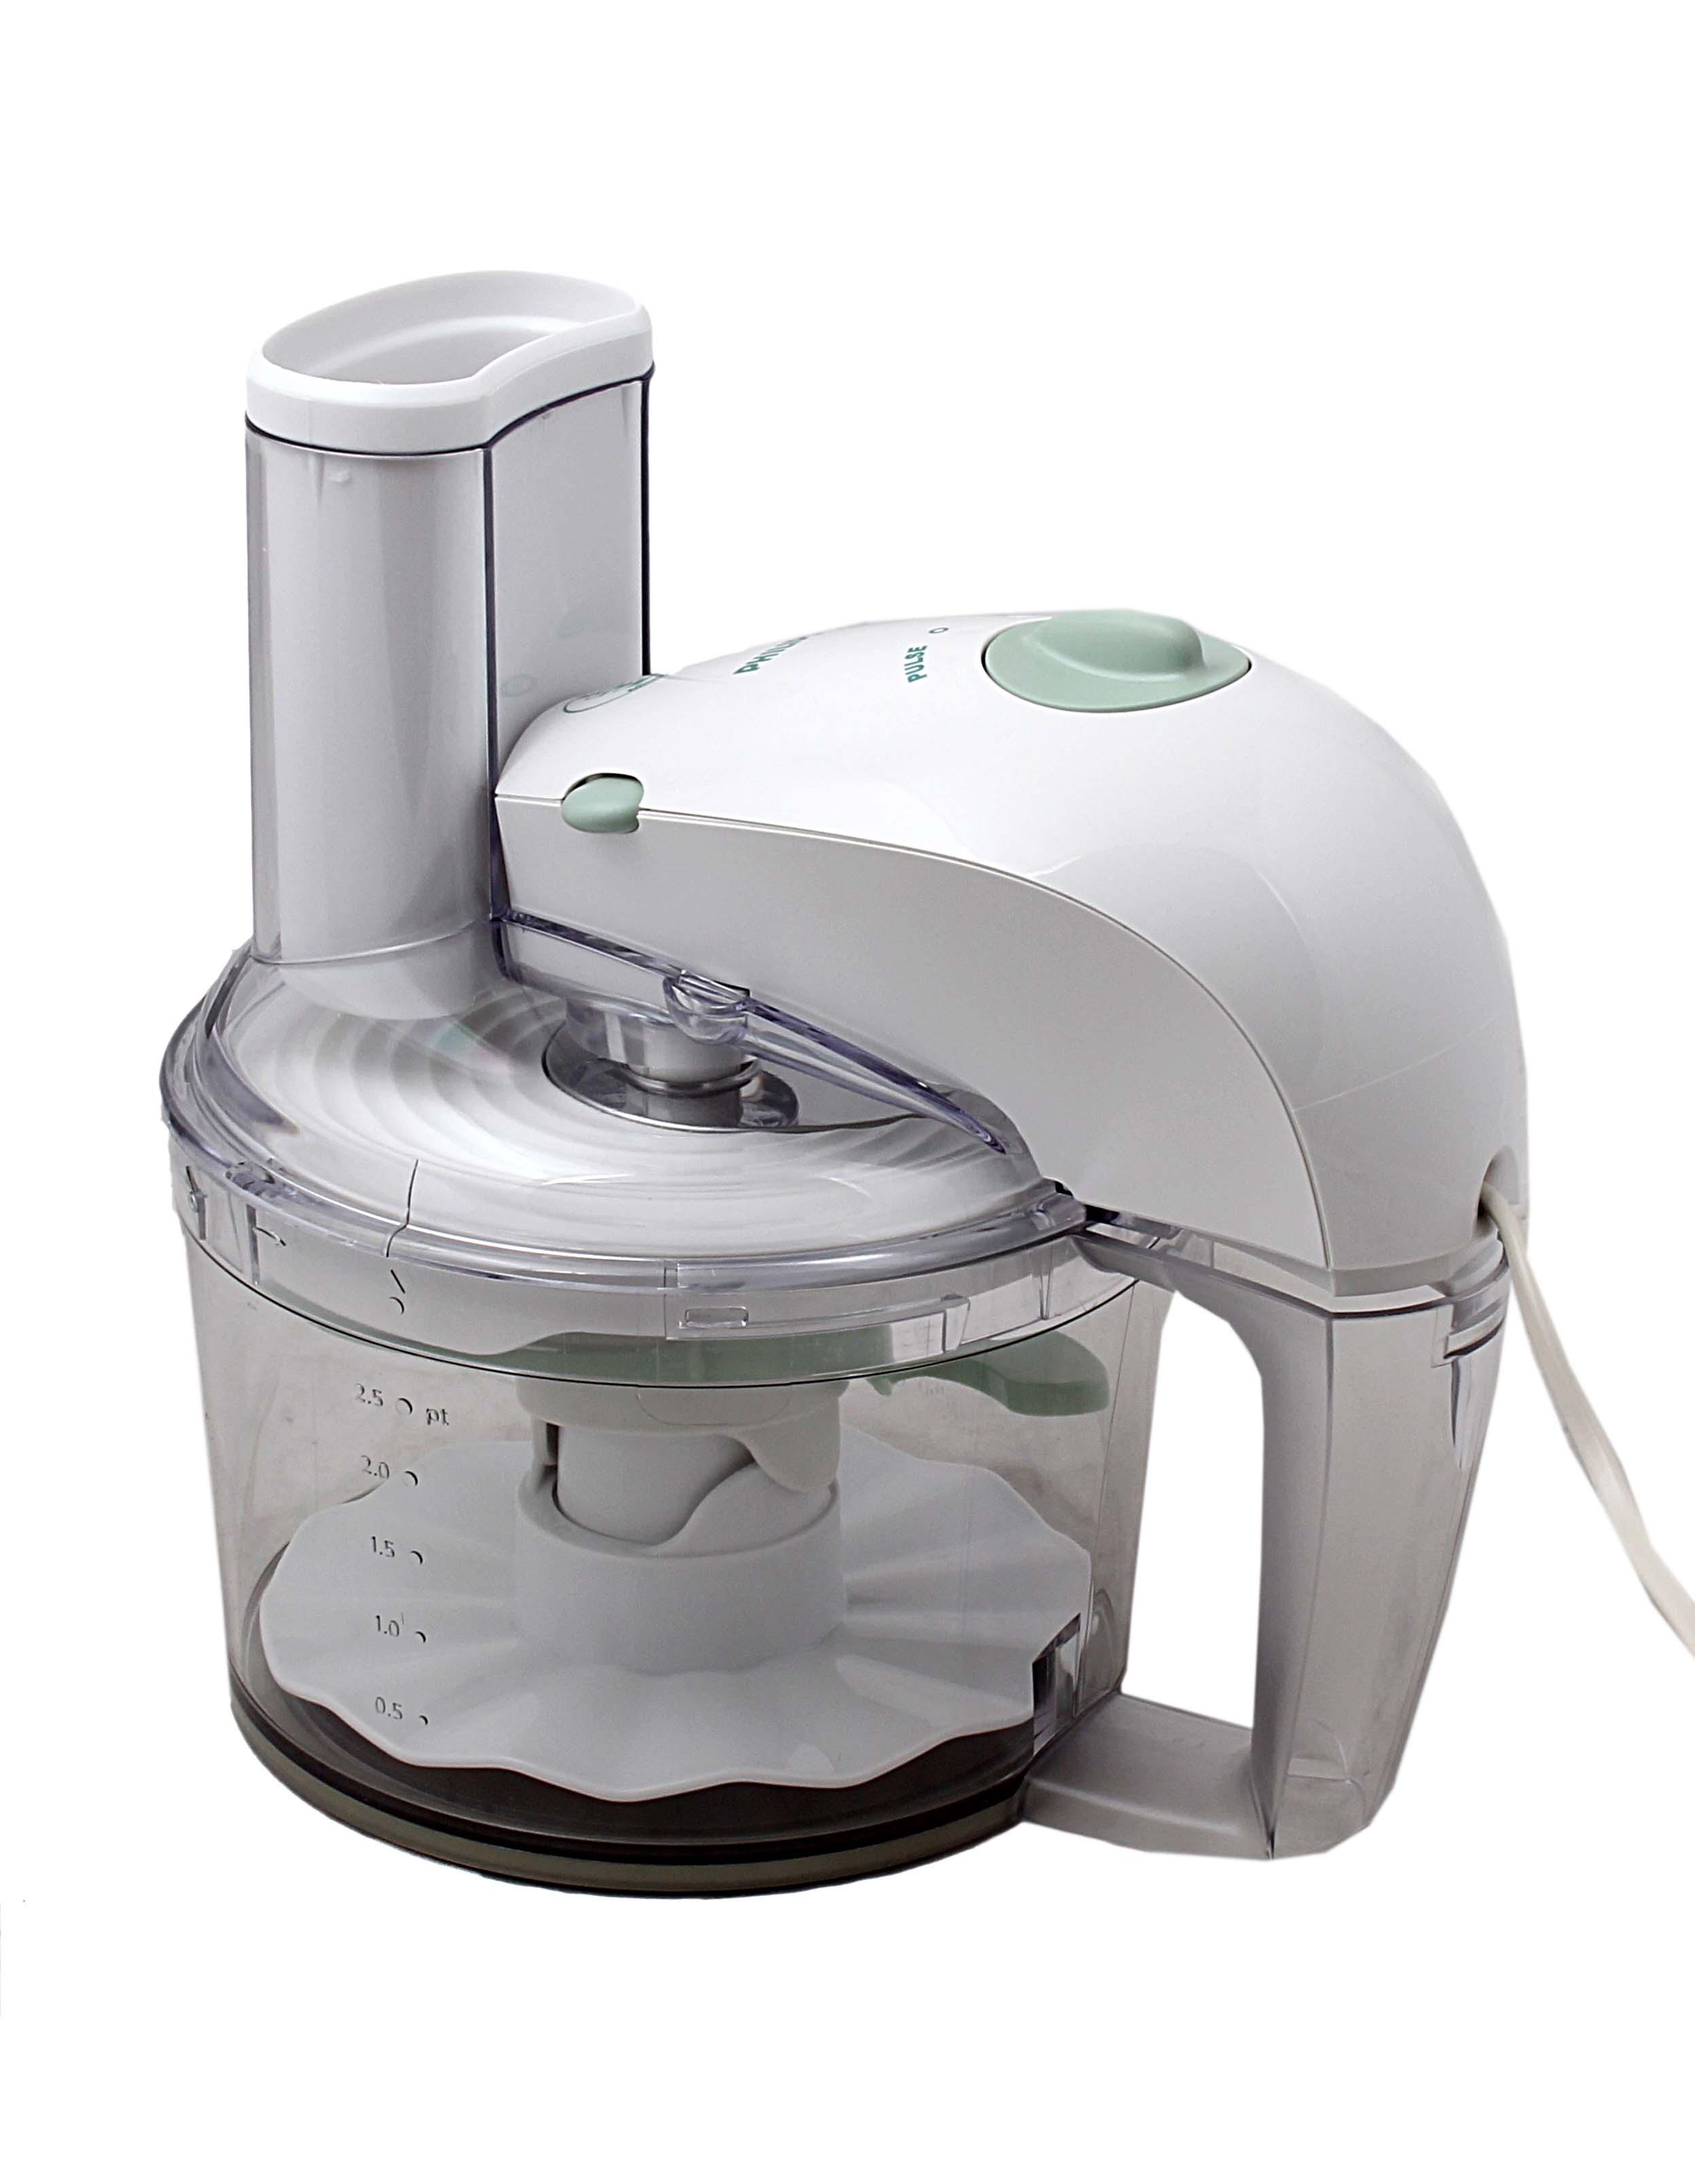 Кухонный комбайн Philips Real Brand Technics 2250.000